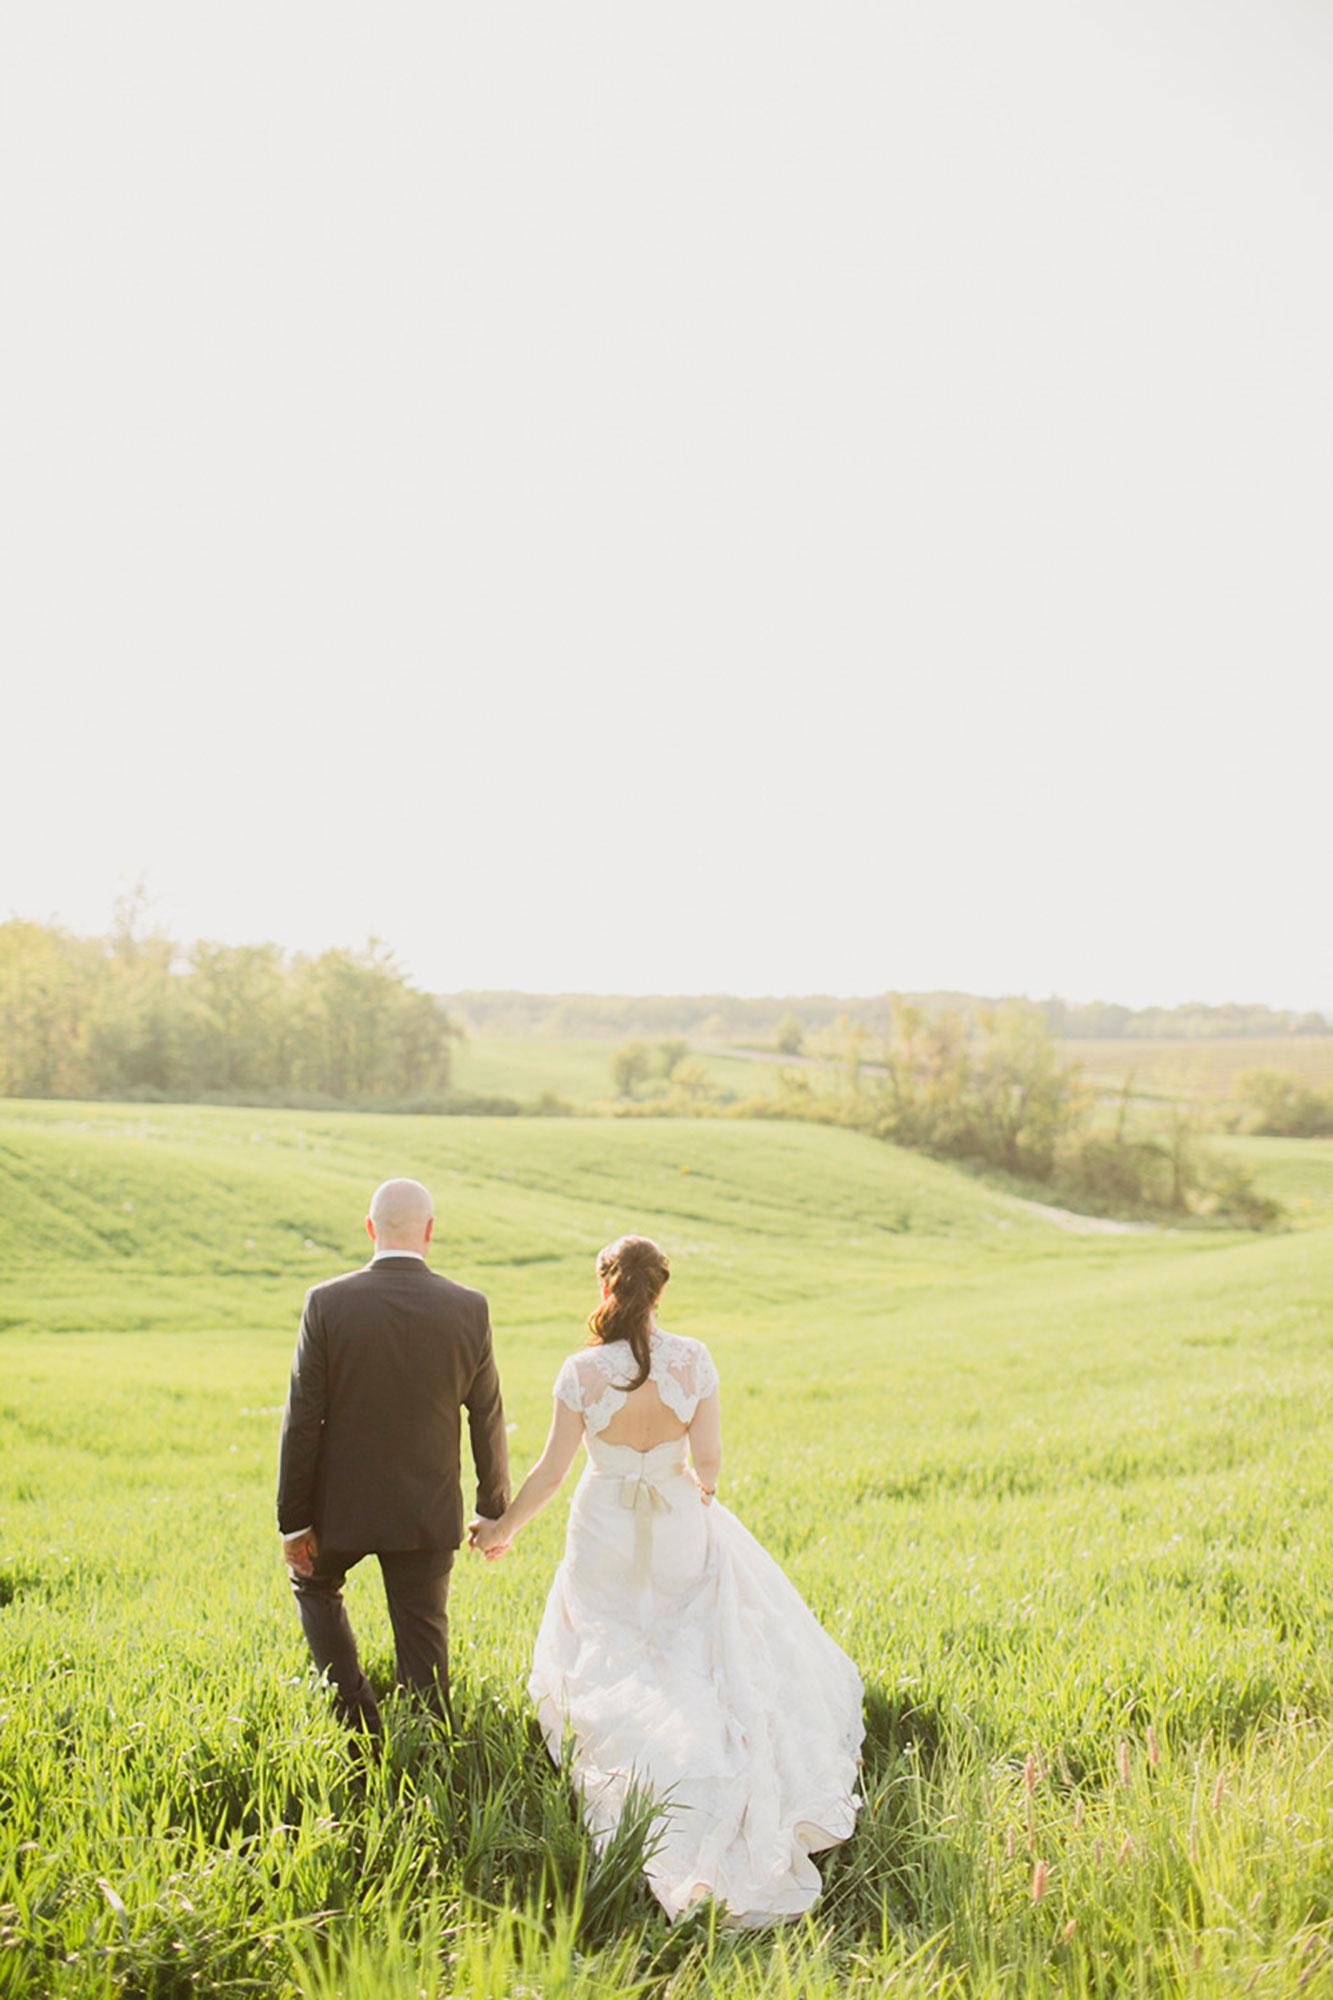 Balls-Falls-Vineyard-Bride-Photo-By-Elizabeth-in-Love-030.jpg